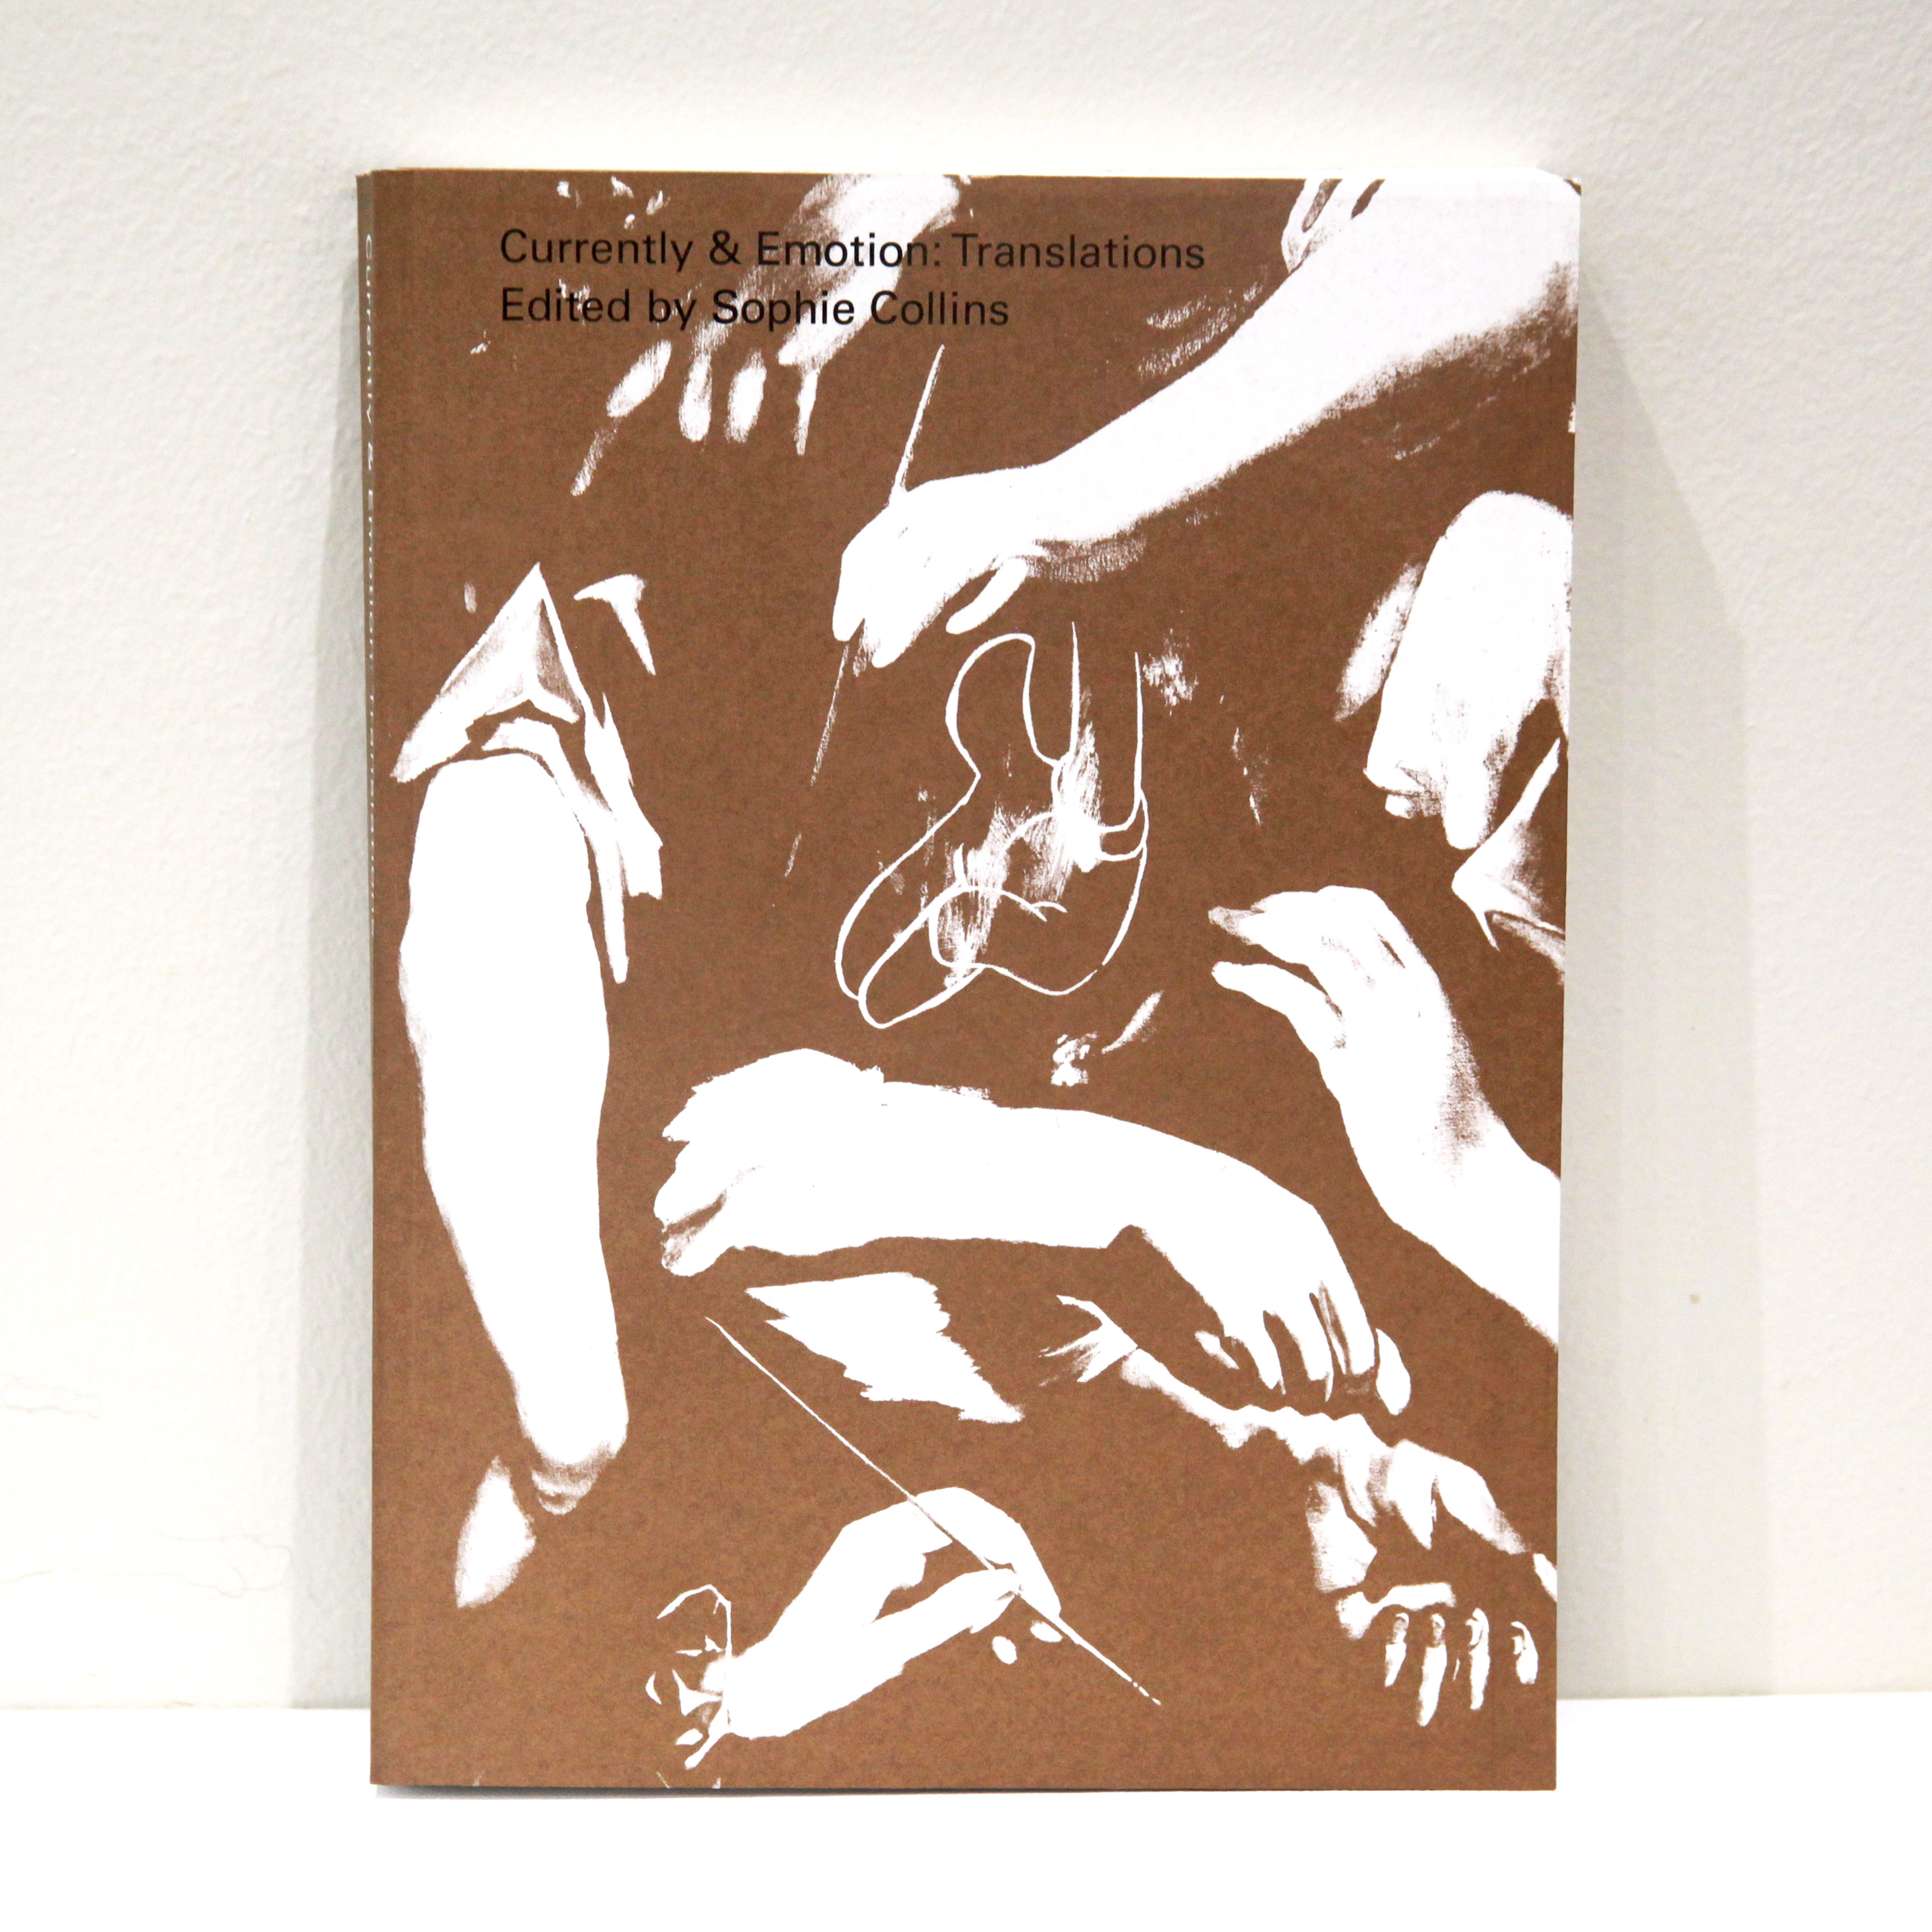 <i>Currently & Emotion</i> ed. by Sophie Collins